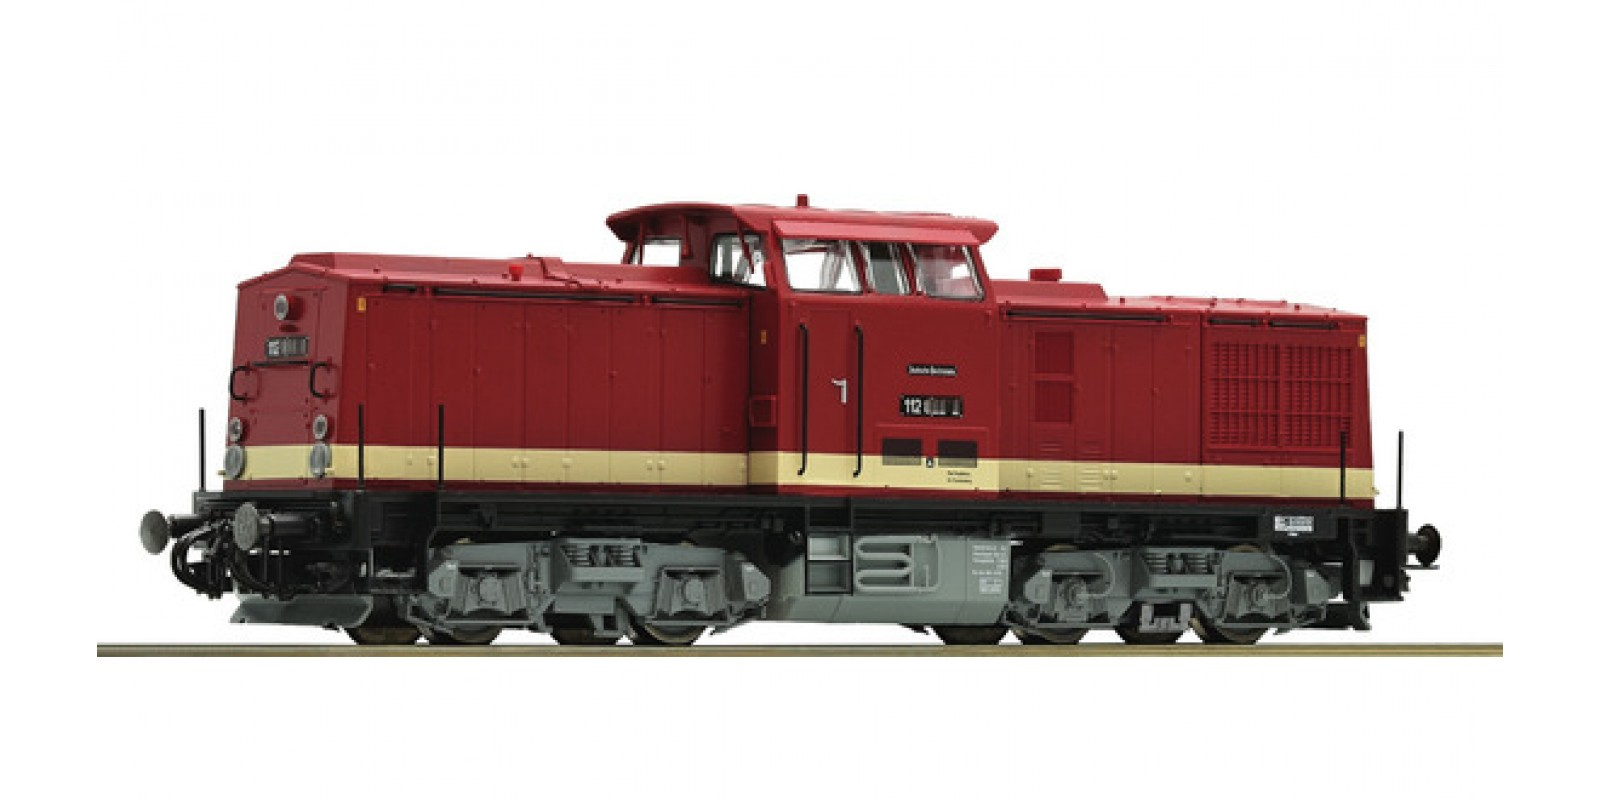 RO79760 - Diesel locomotive class 112, DR